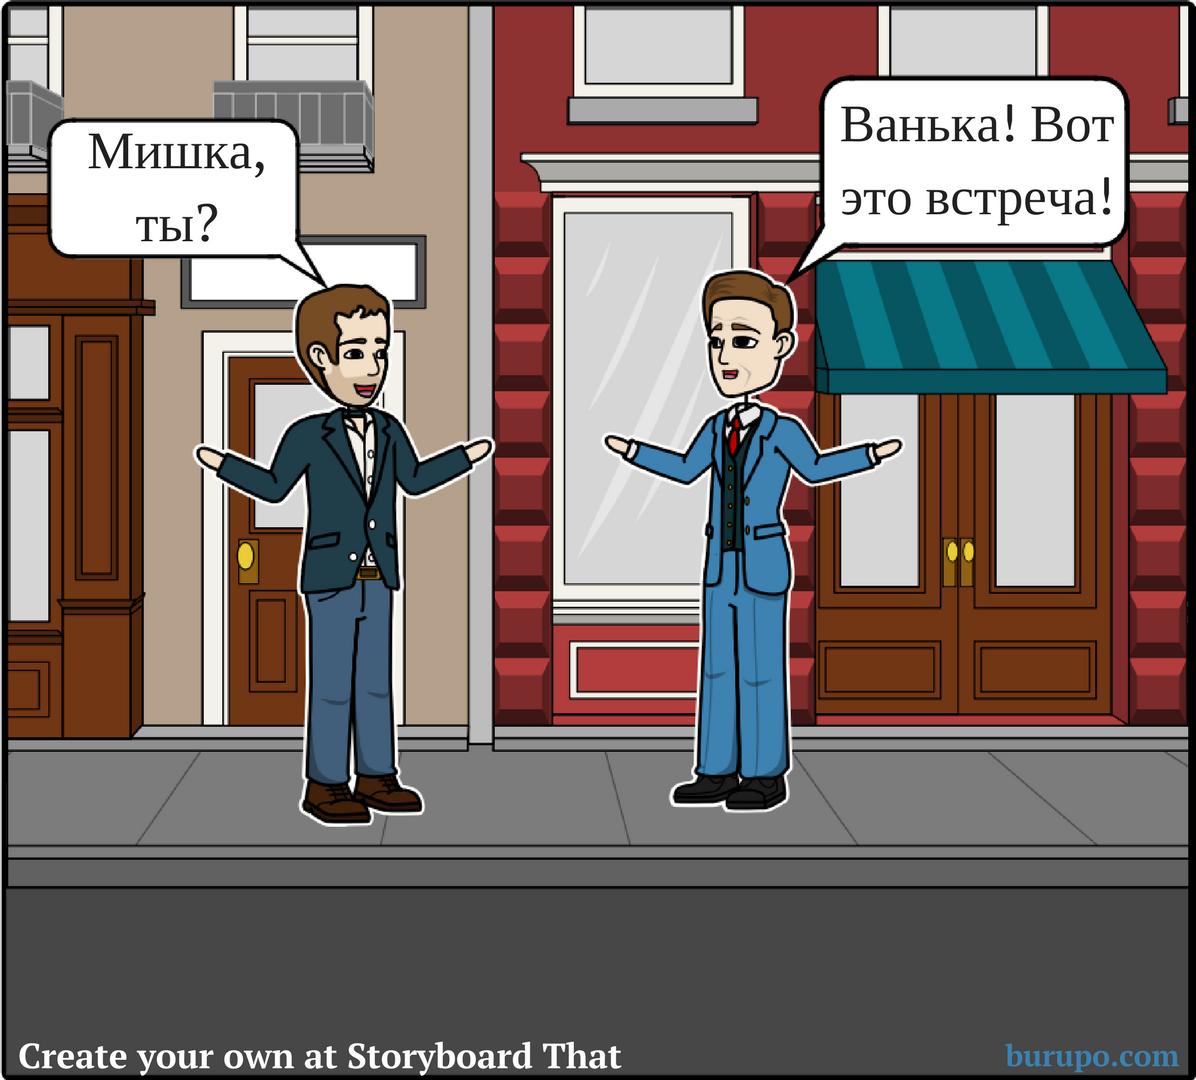 глаголы движения / russian verbs of motion example 3